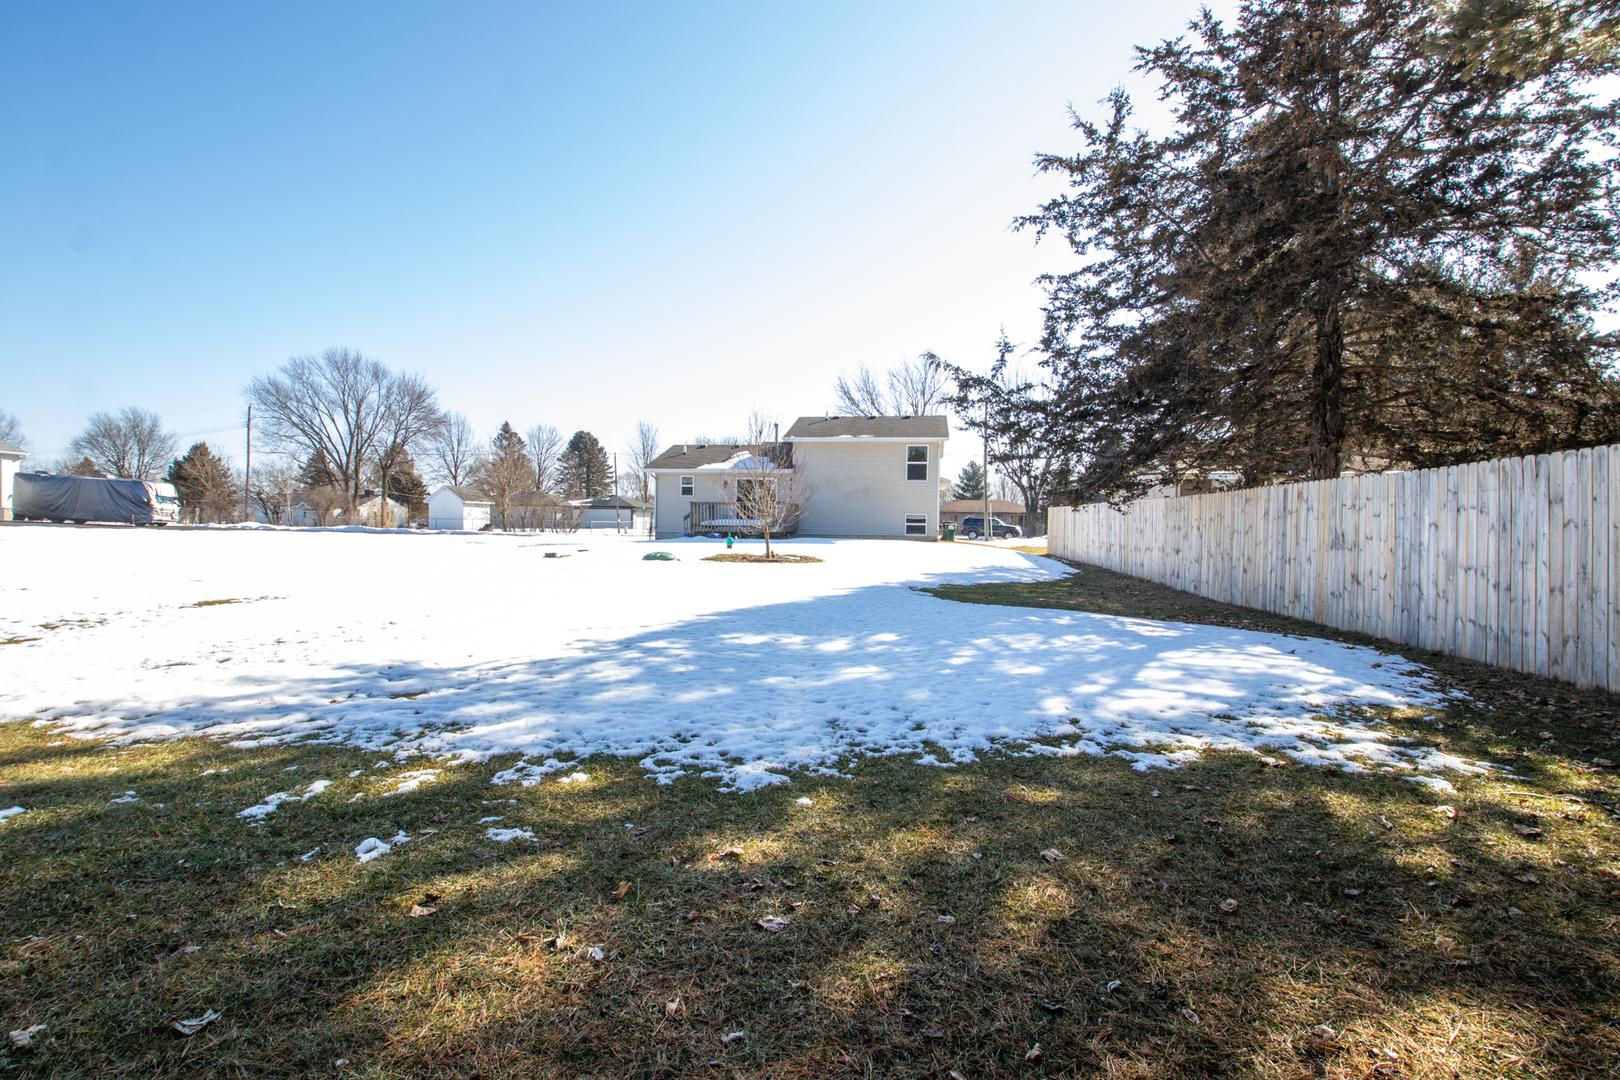 4596 Mathew, Roscoe, Illinois, 61073